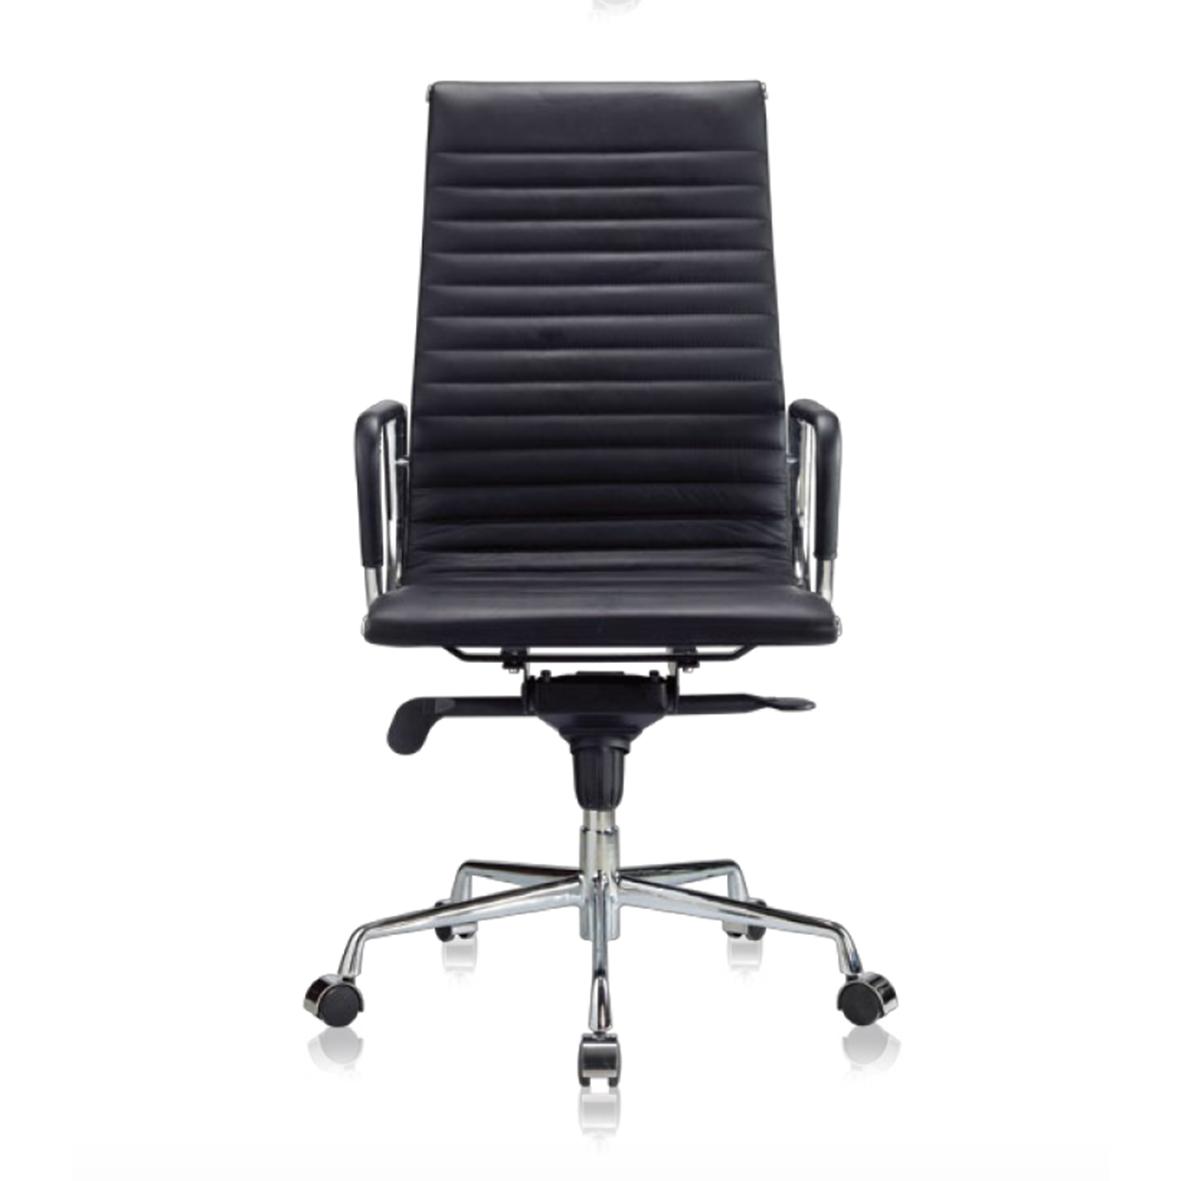 UPlan ITZE chair.jpg